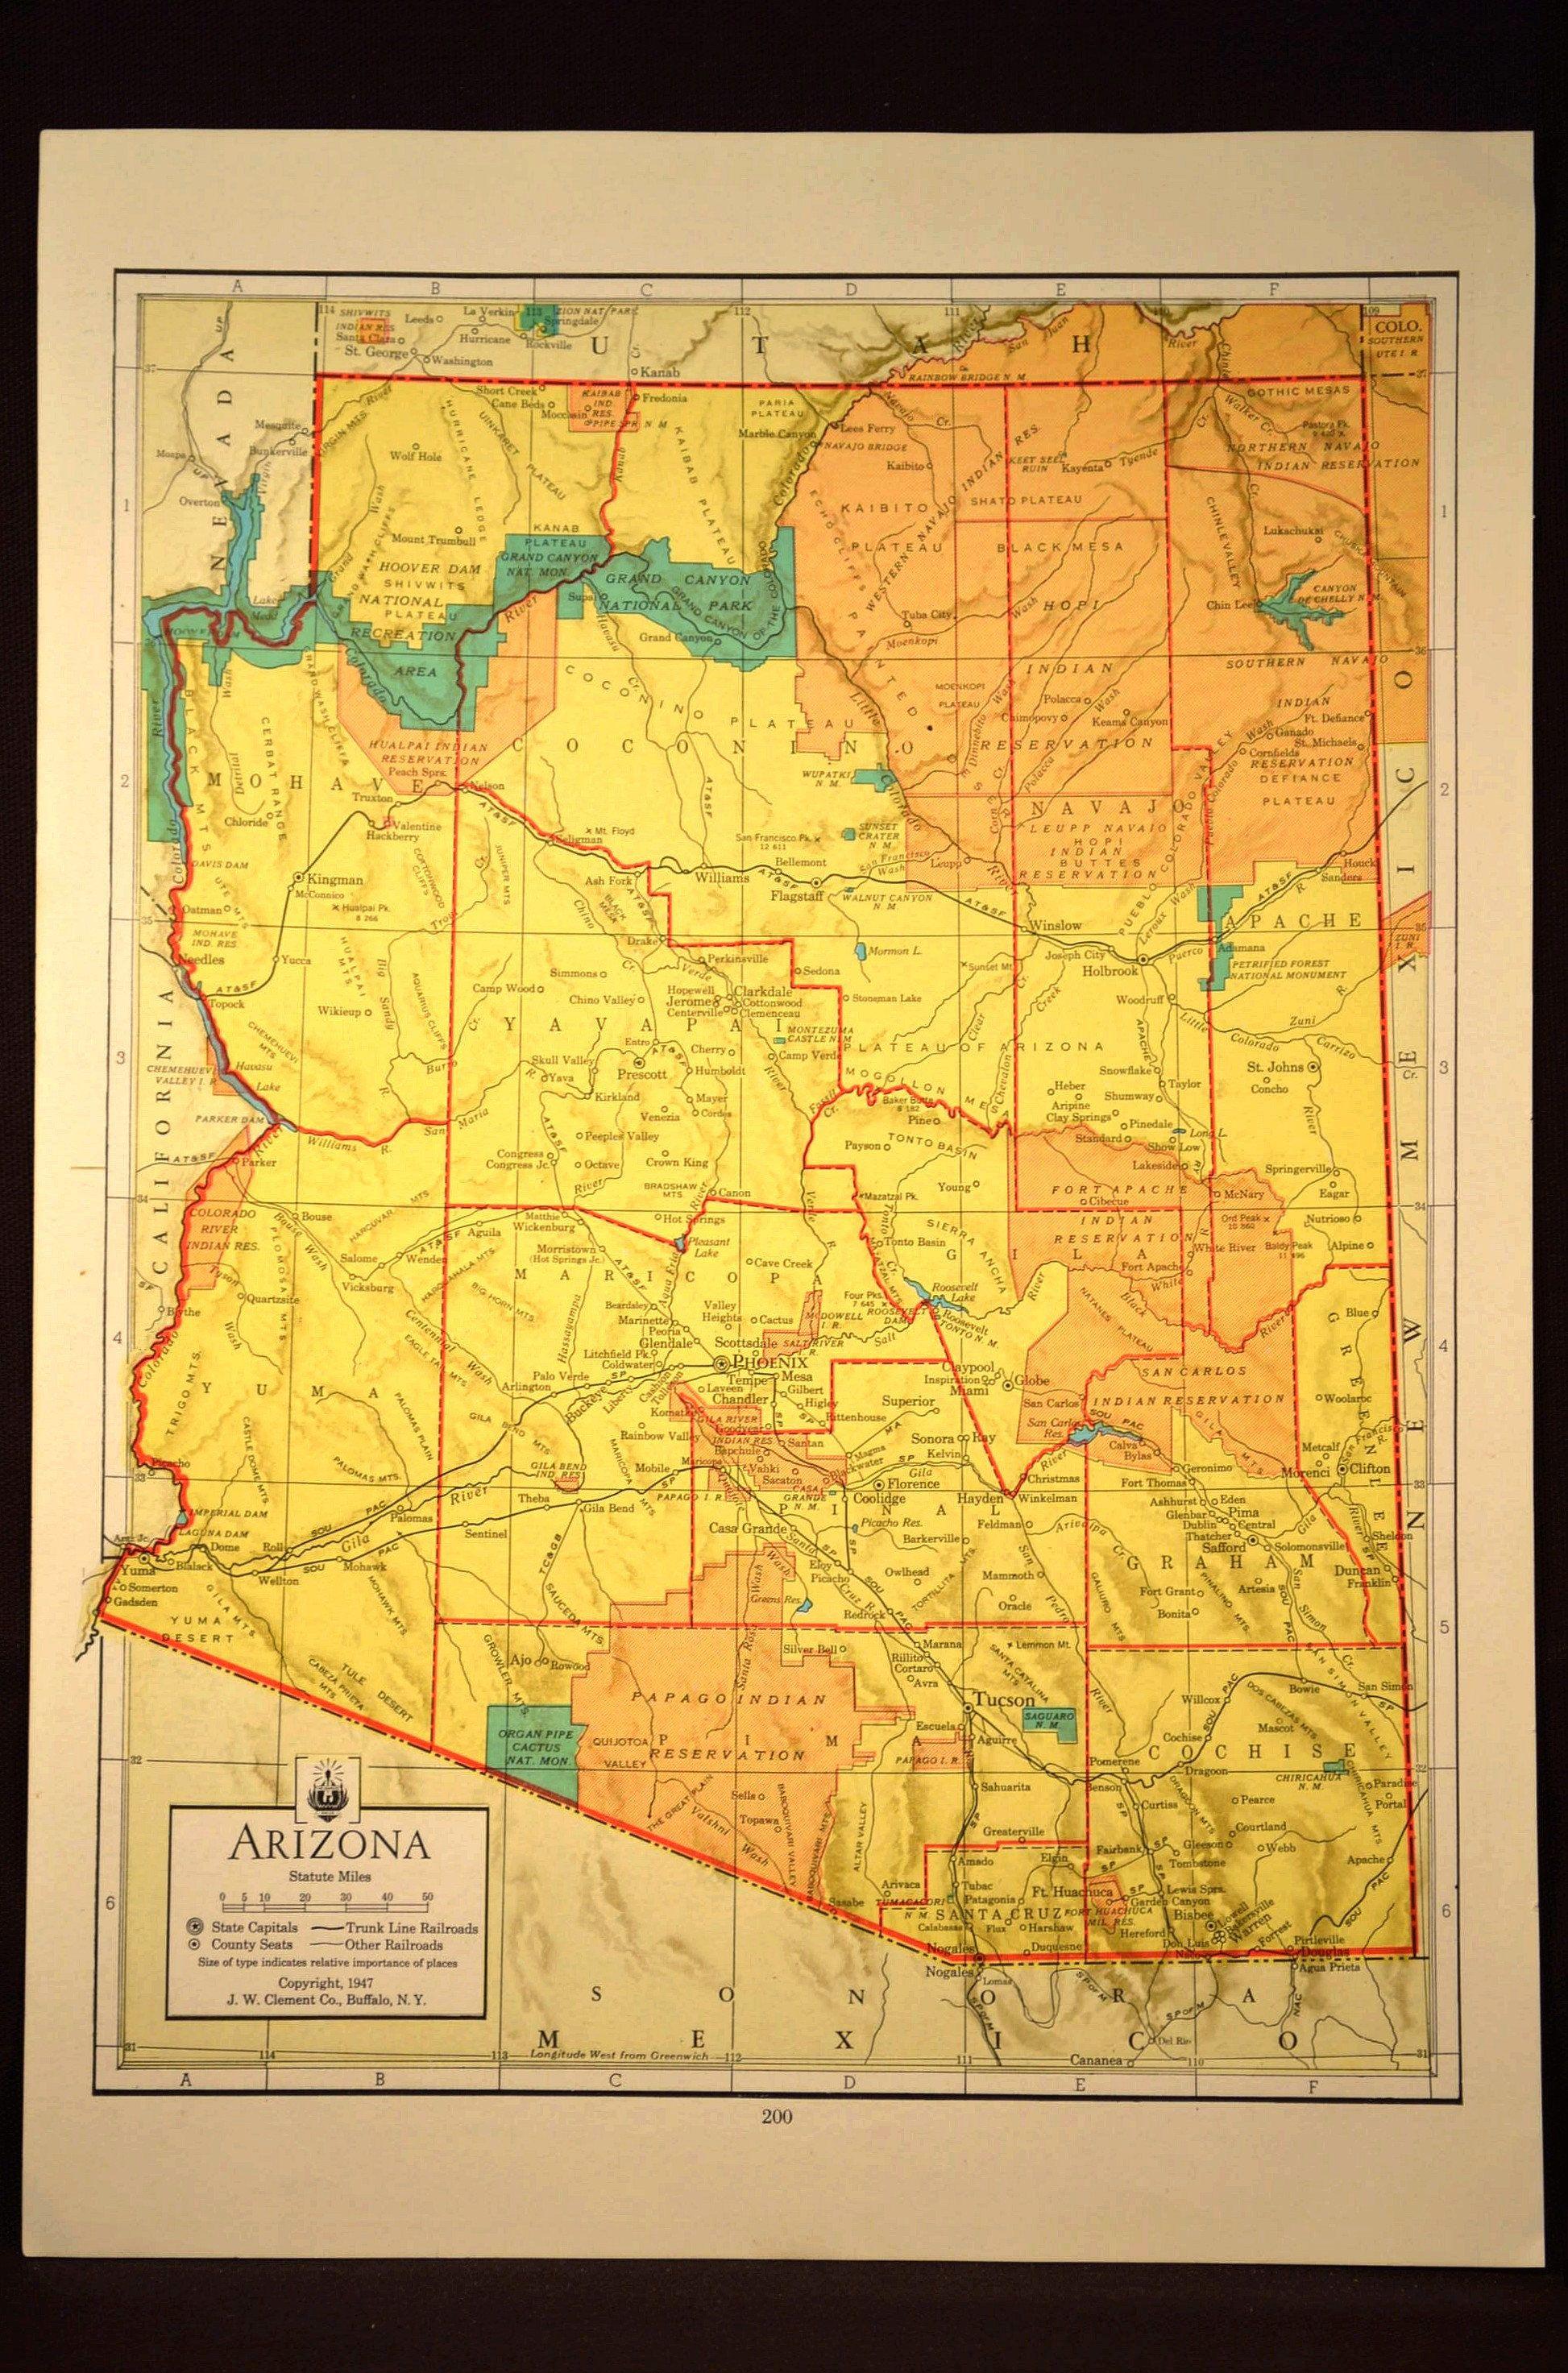 Arizona Map Of Arizona Wall Art Decor Original 1940s Colorful Etsy Arizona Map Bird Prints Insect Print